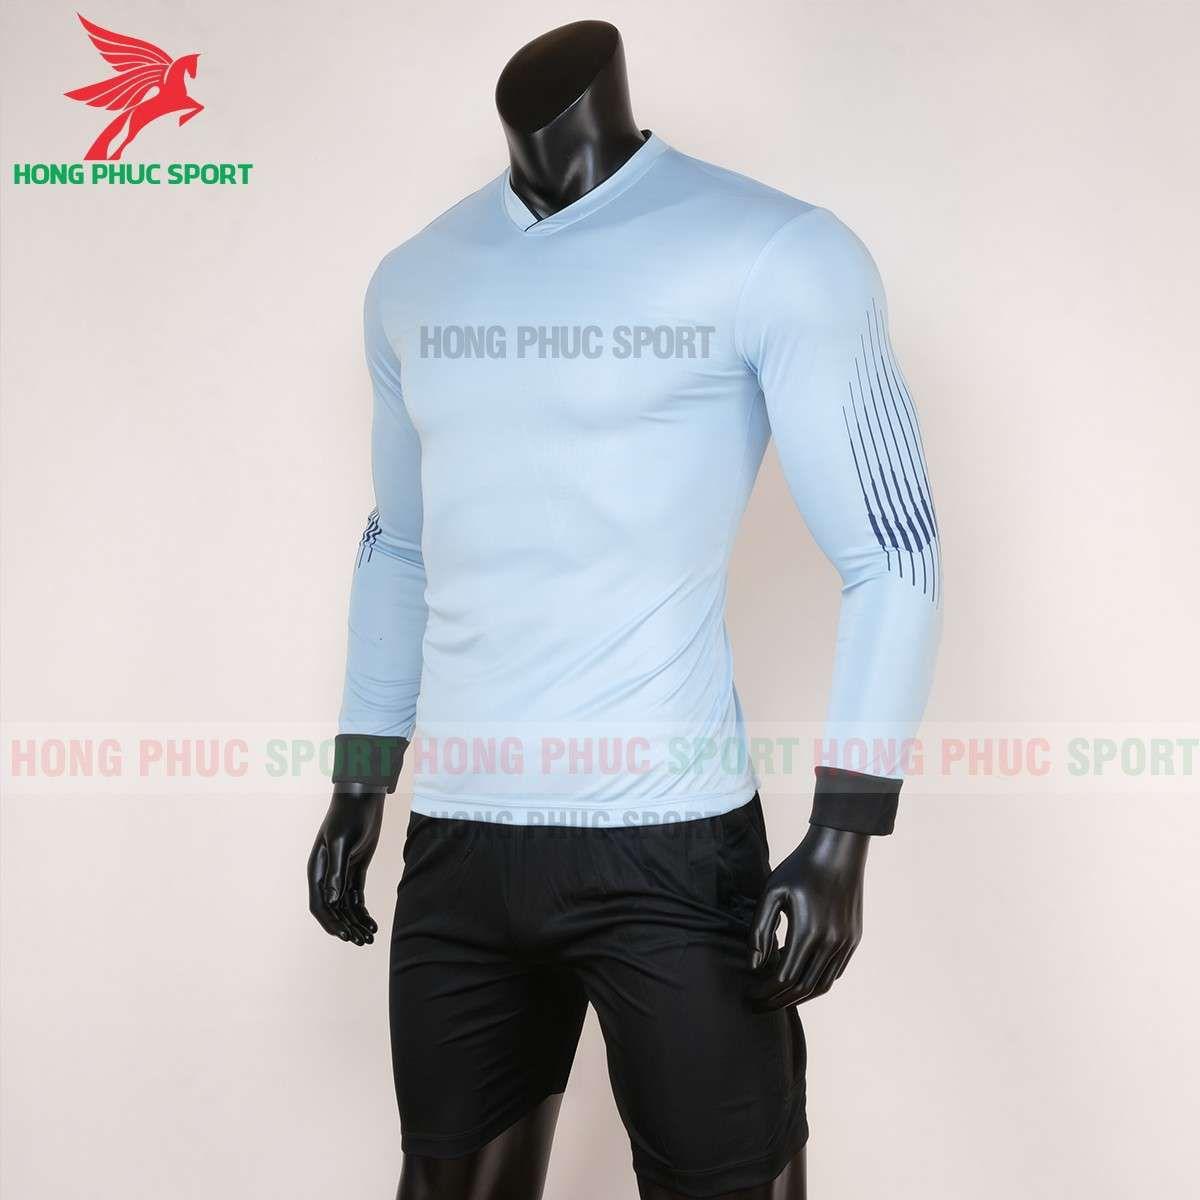 https://cdn.hongphucsport.com/unsafe/cdn.hongphucsport.com/dothethao.net.vn/wp-content/uploads/2020/02/do-da-banh-thu-mon-tay-dai-2020-mau-xanh-ghi-3.jpg